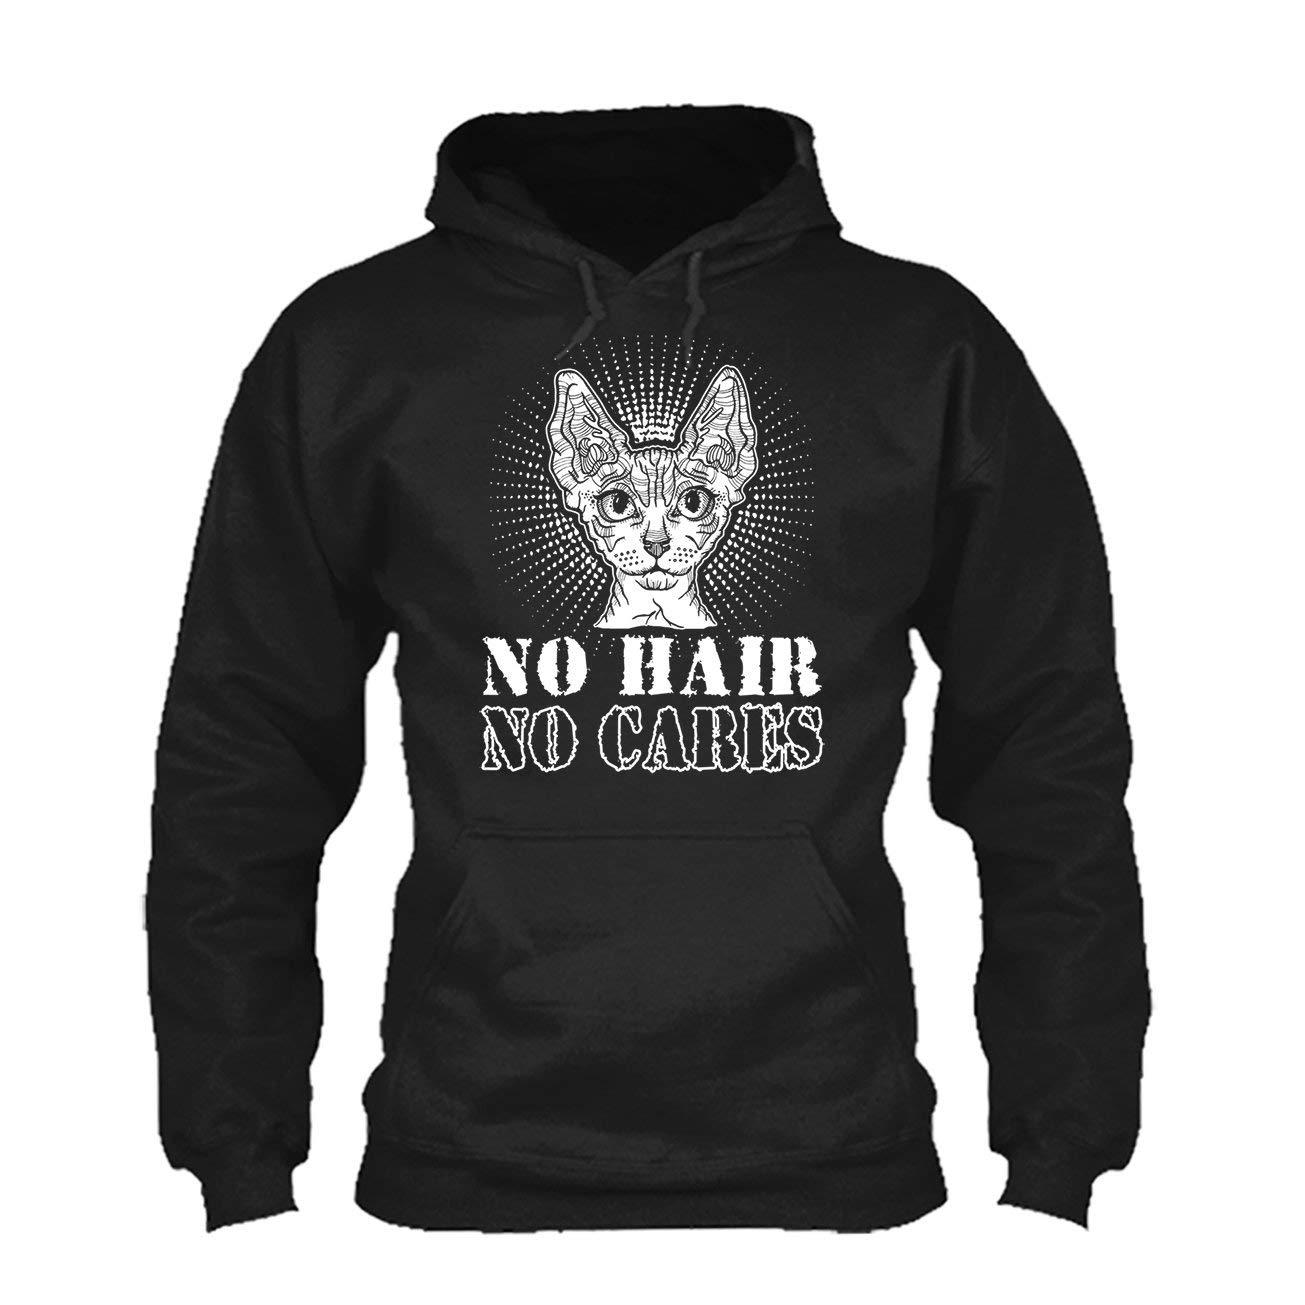 Shirt Hoodies Sphynx Cat No Hair No Cares Tee Shirt